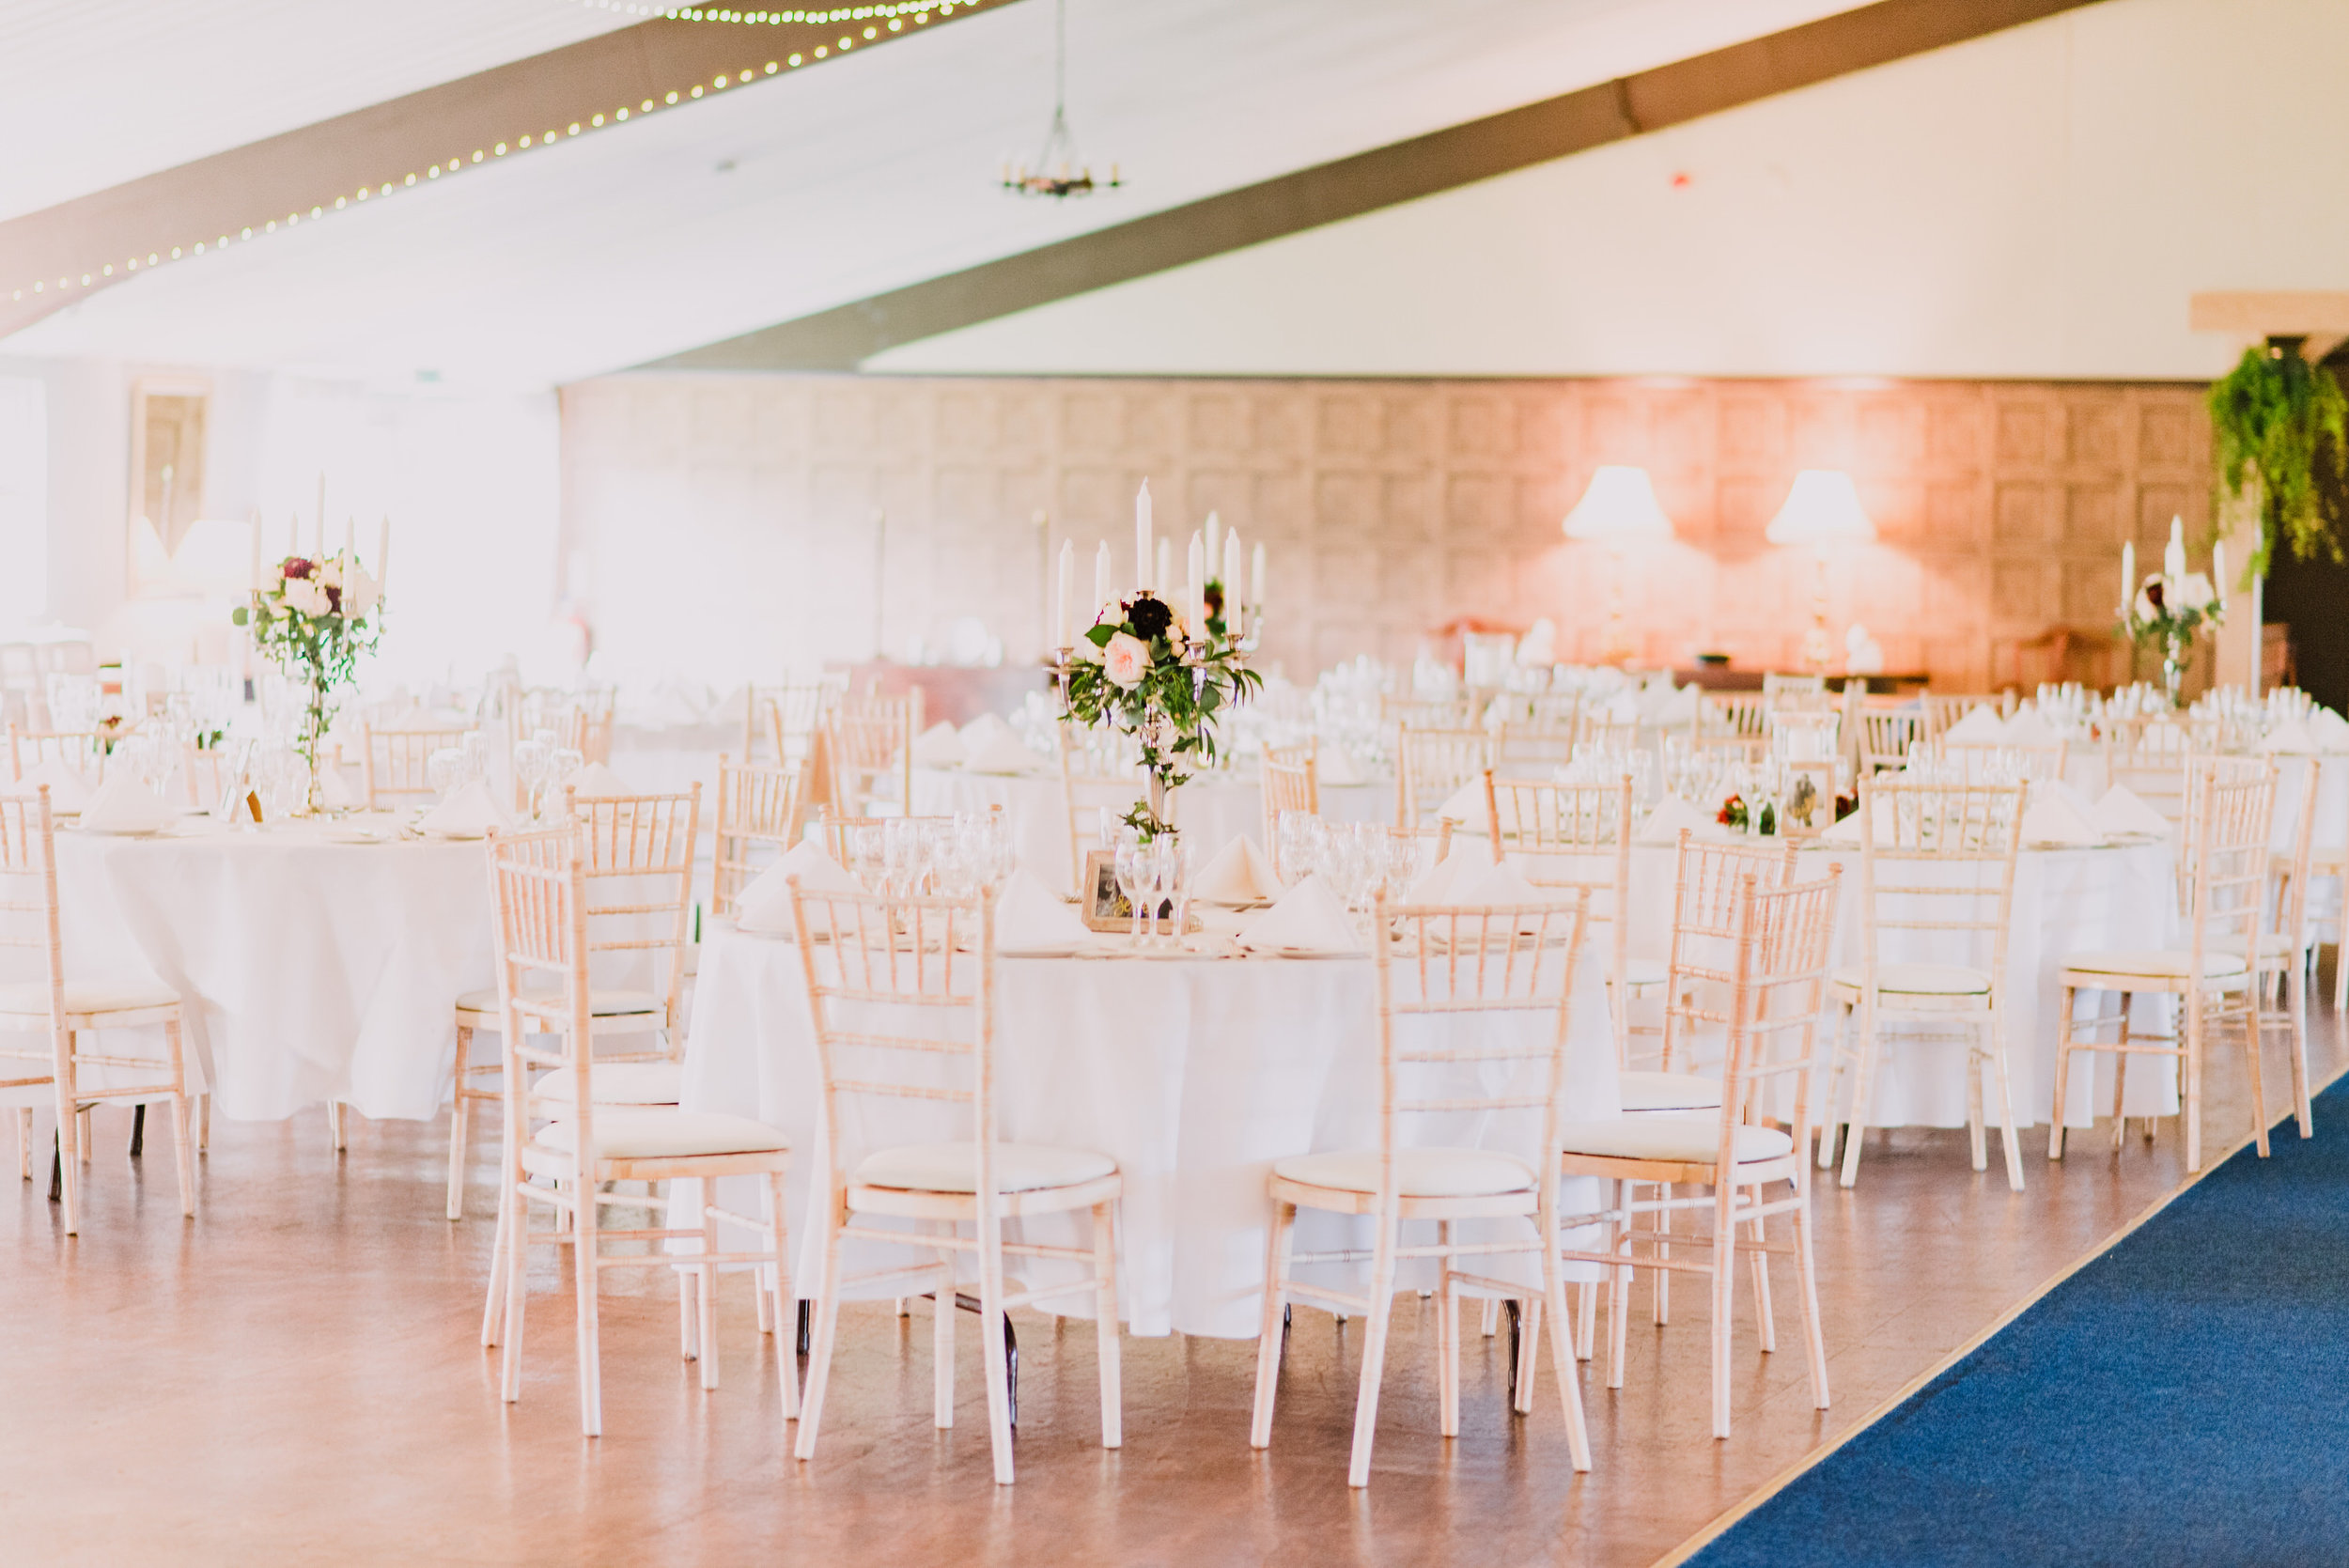 lissanoure castle wedding, northern ireland wedding photographer, romantic northern irish wedding venue, castle wedding ireland, natural wedding photography ni (93).jpg